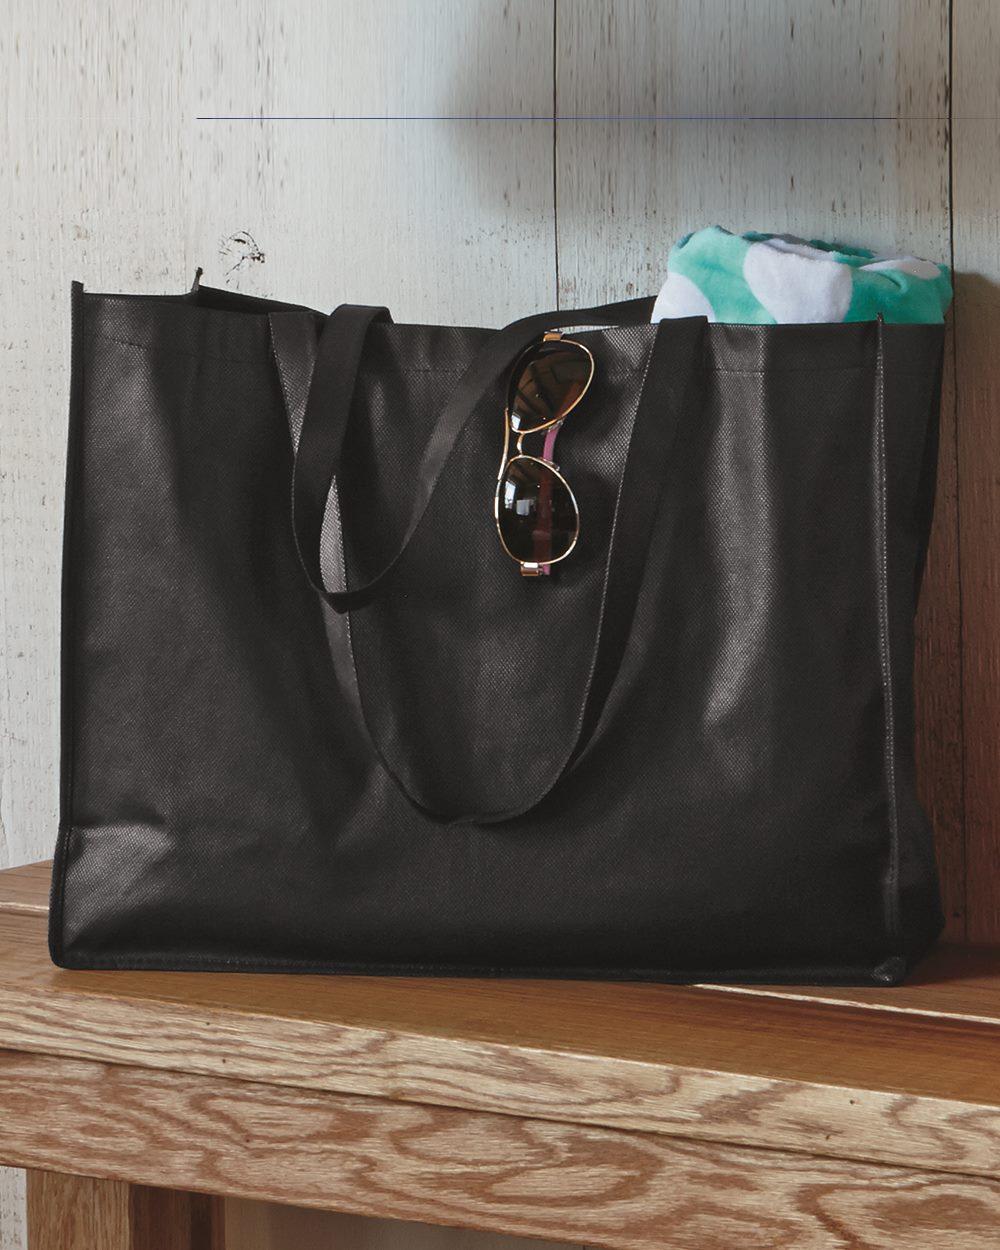 Liberty Bags A135 - Non-Woven Deluxe Tote